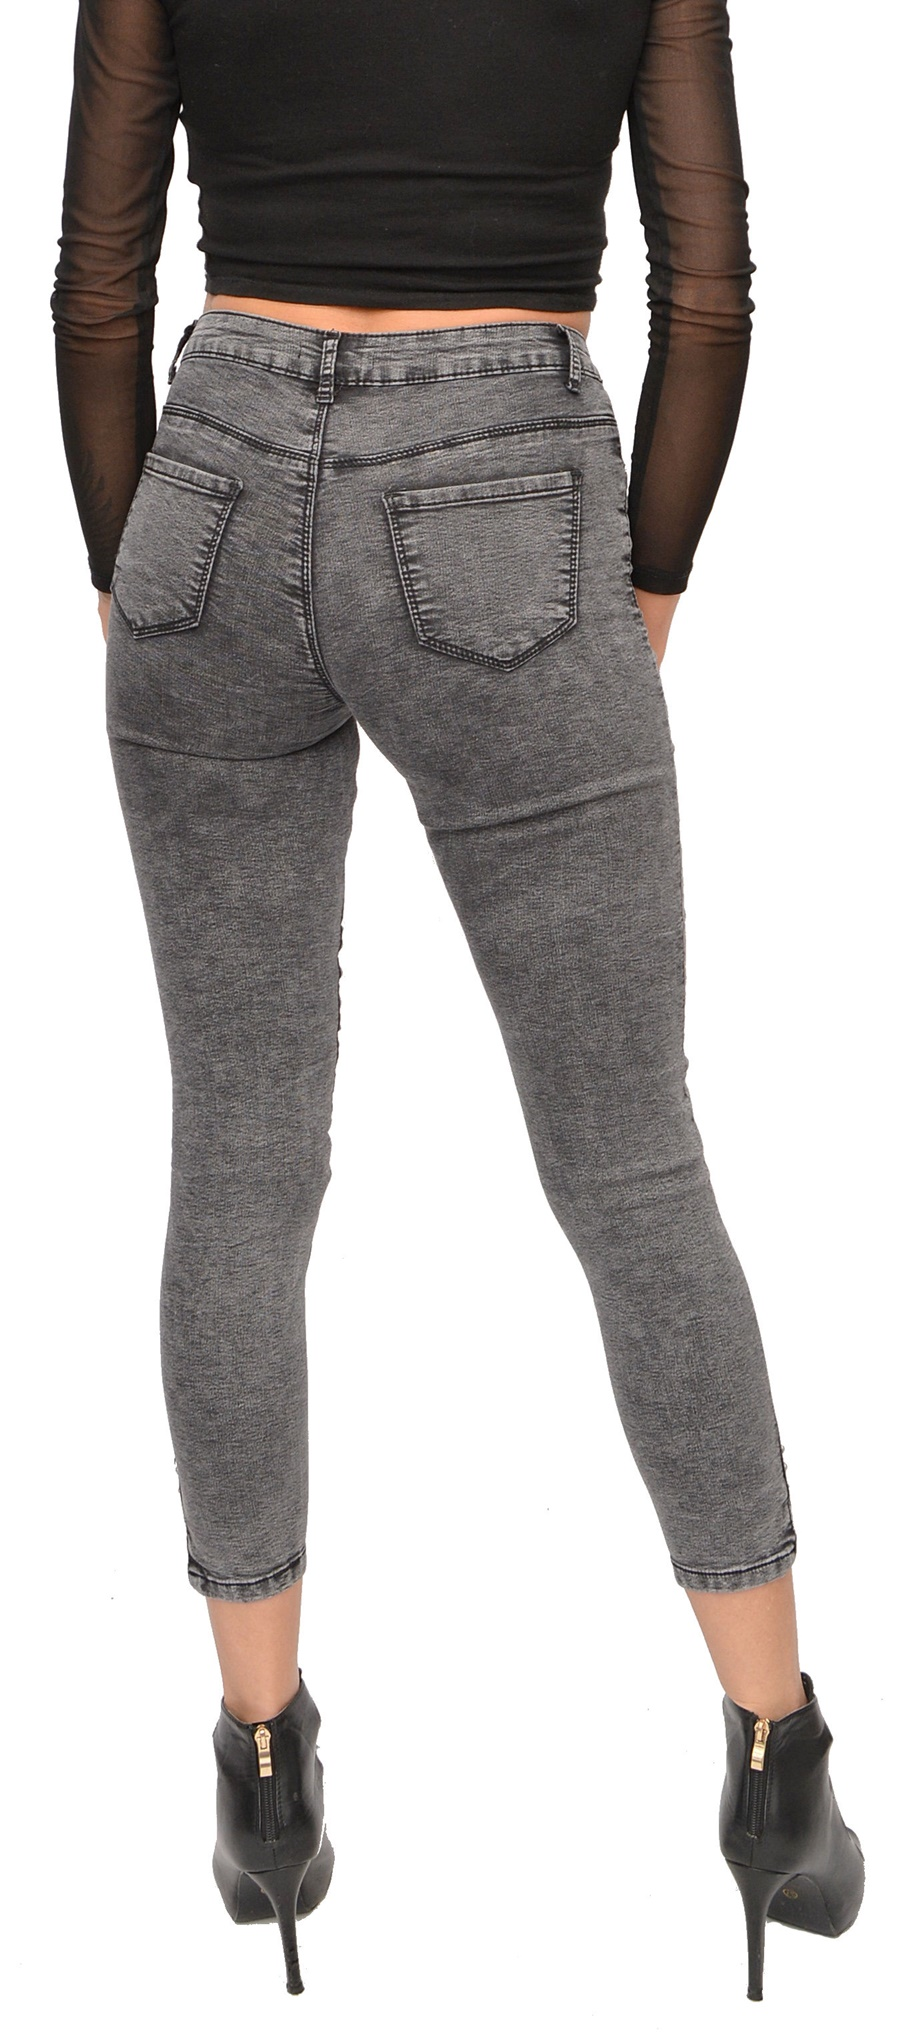 7becb12e DM6311F2 szare SPODNIE jeansy DEKAT z cekinami 28 - 7192343182 ...